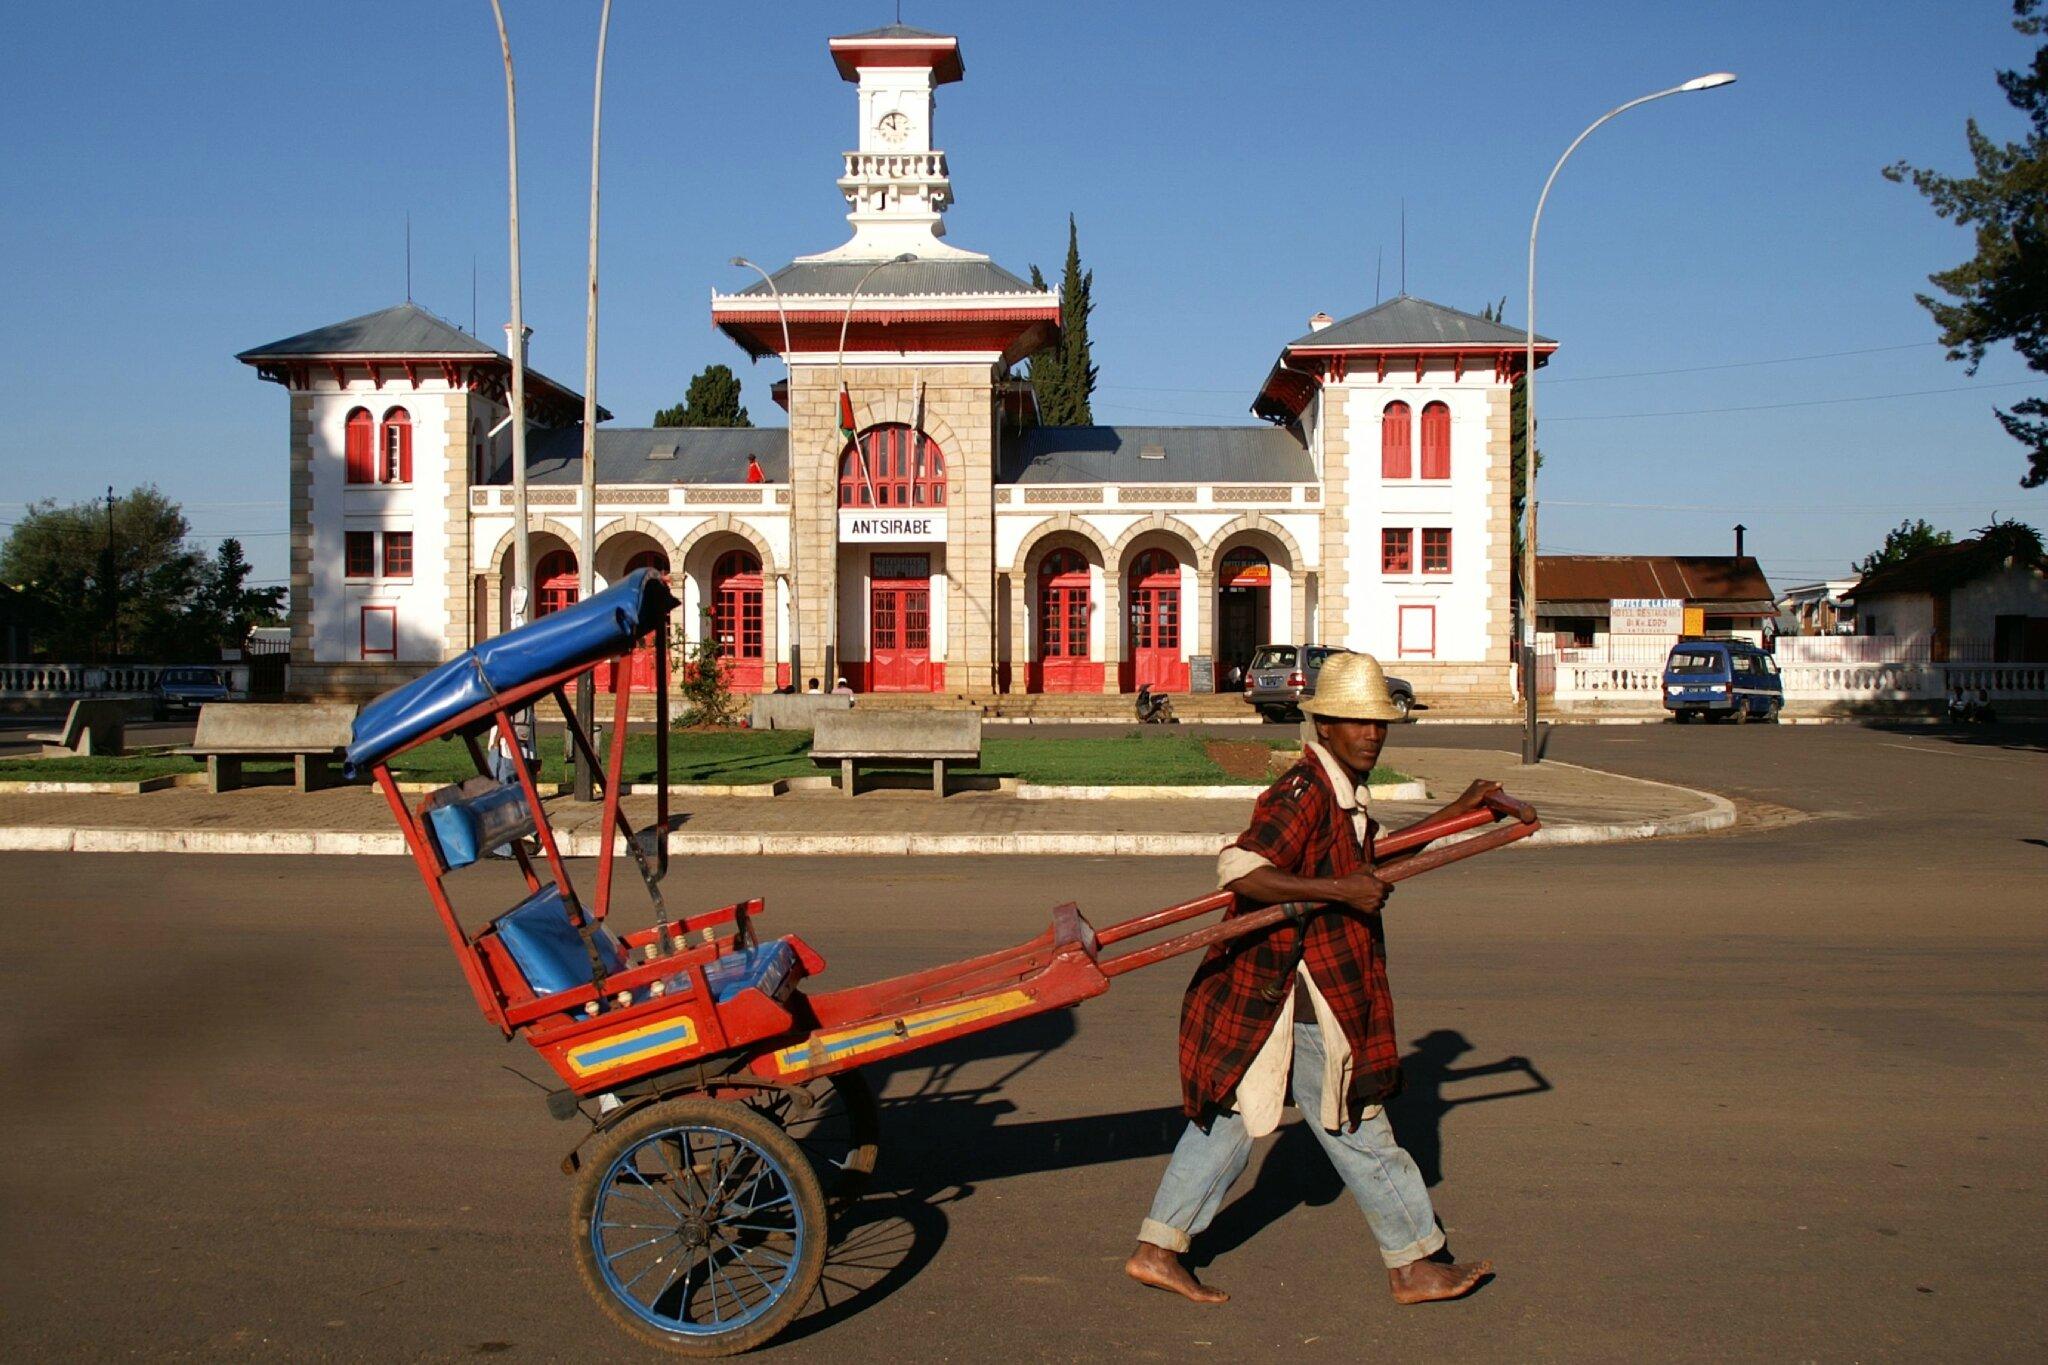 La Gare d'Antsirabé